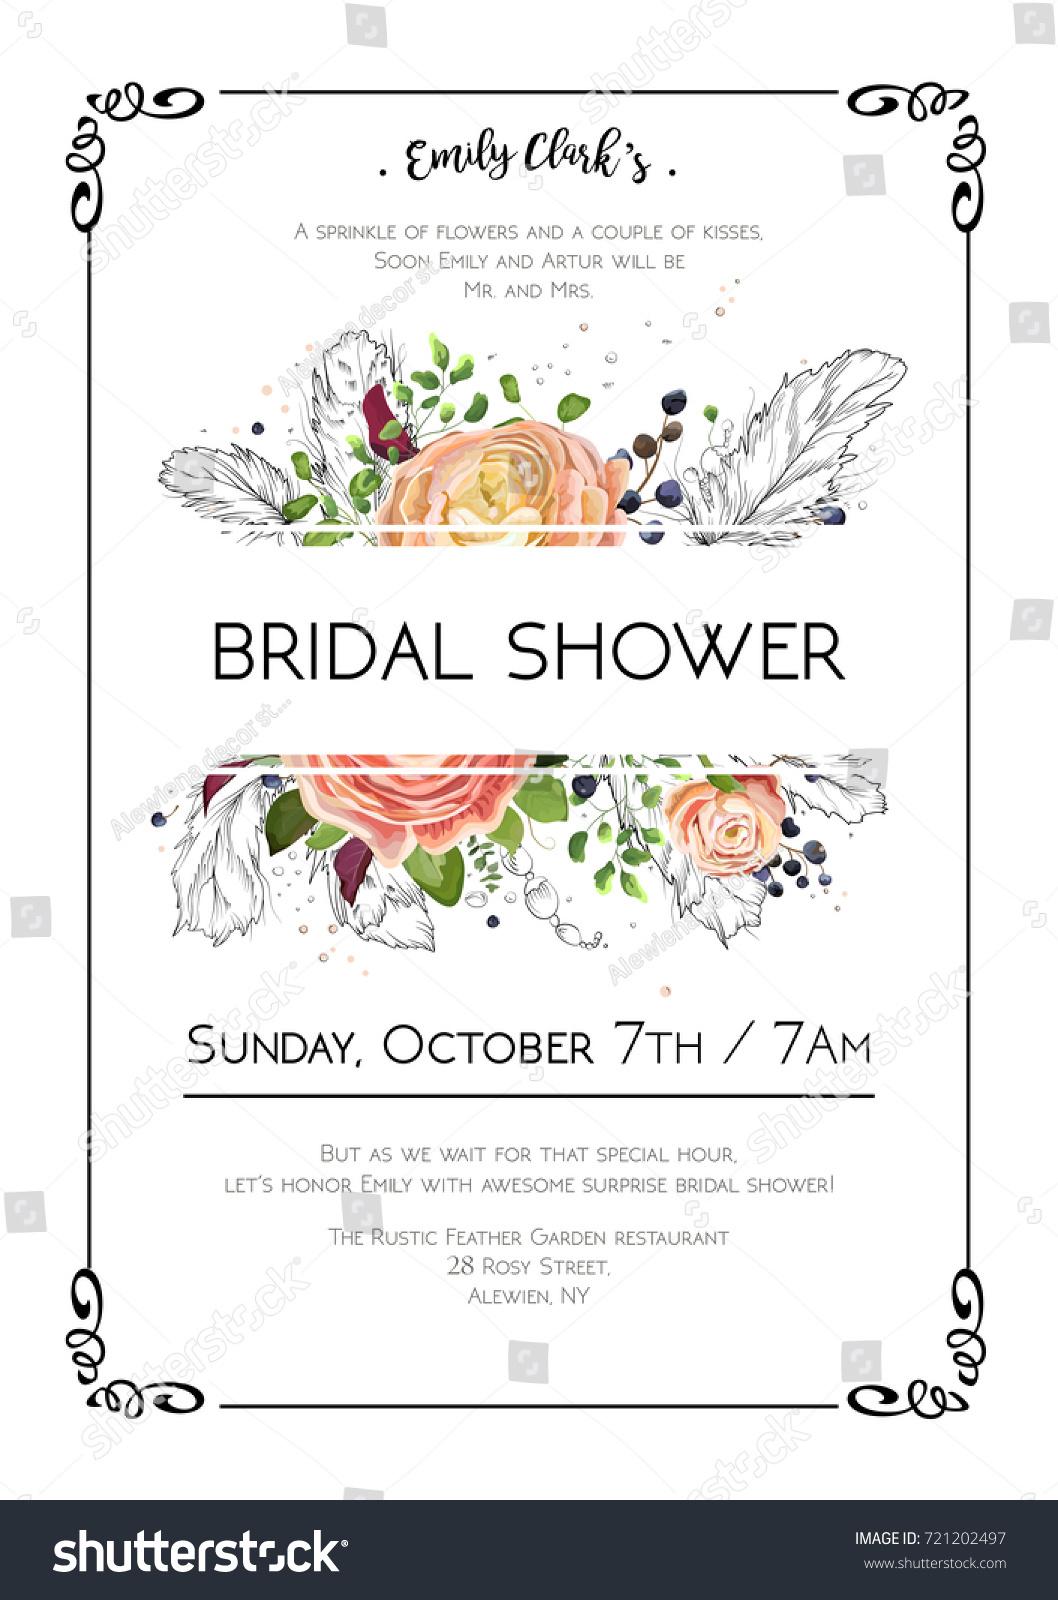 Bridal Shower Vector Boho Art Wedding Stock Vector 2018 721202497